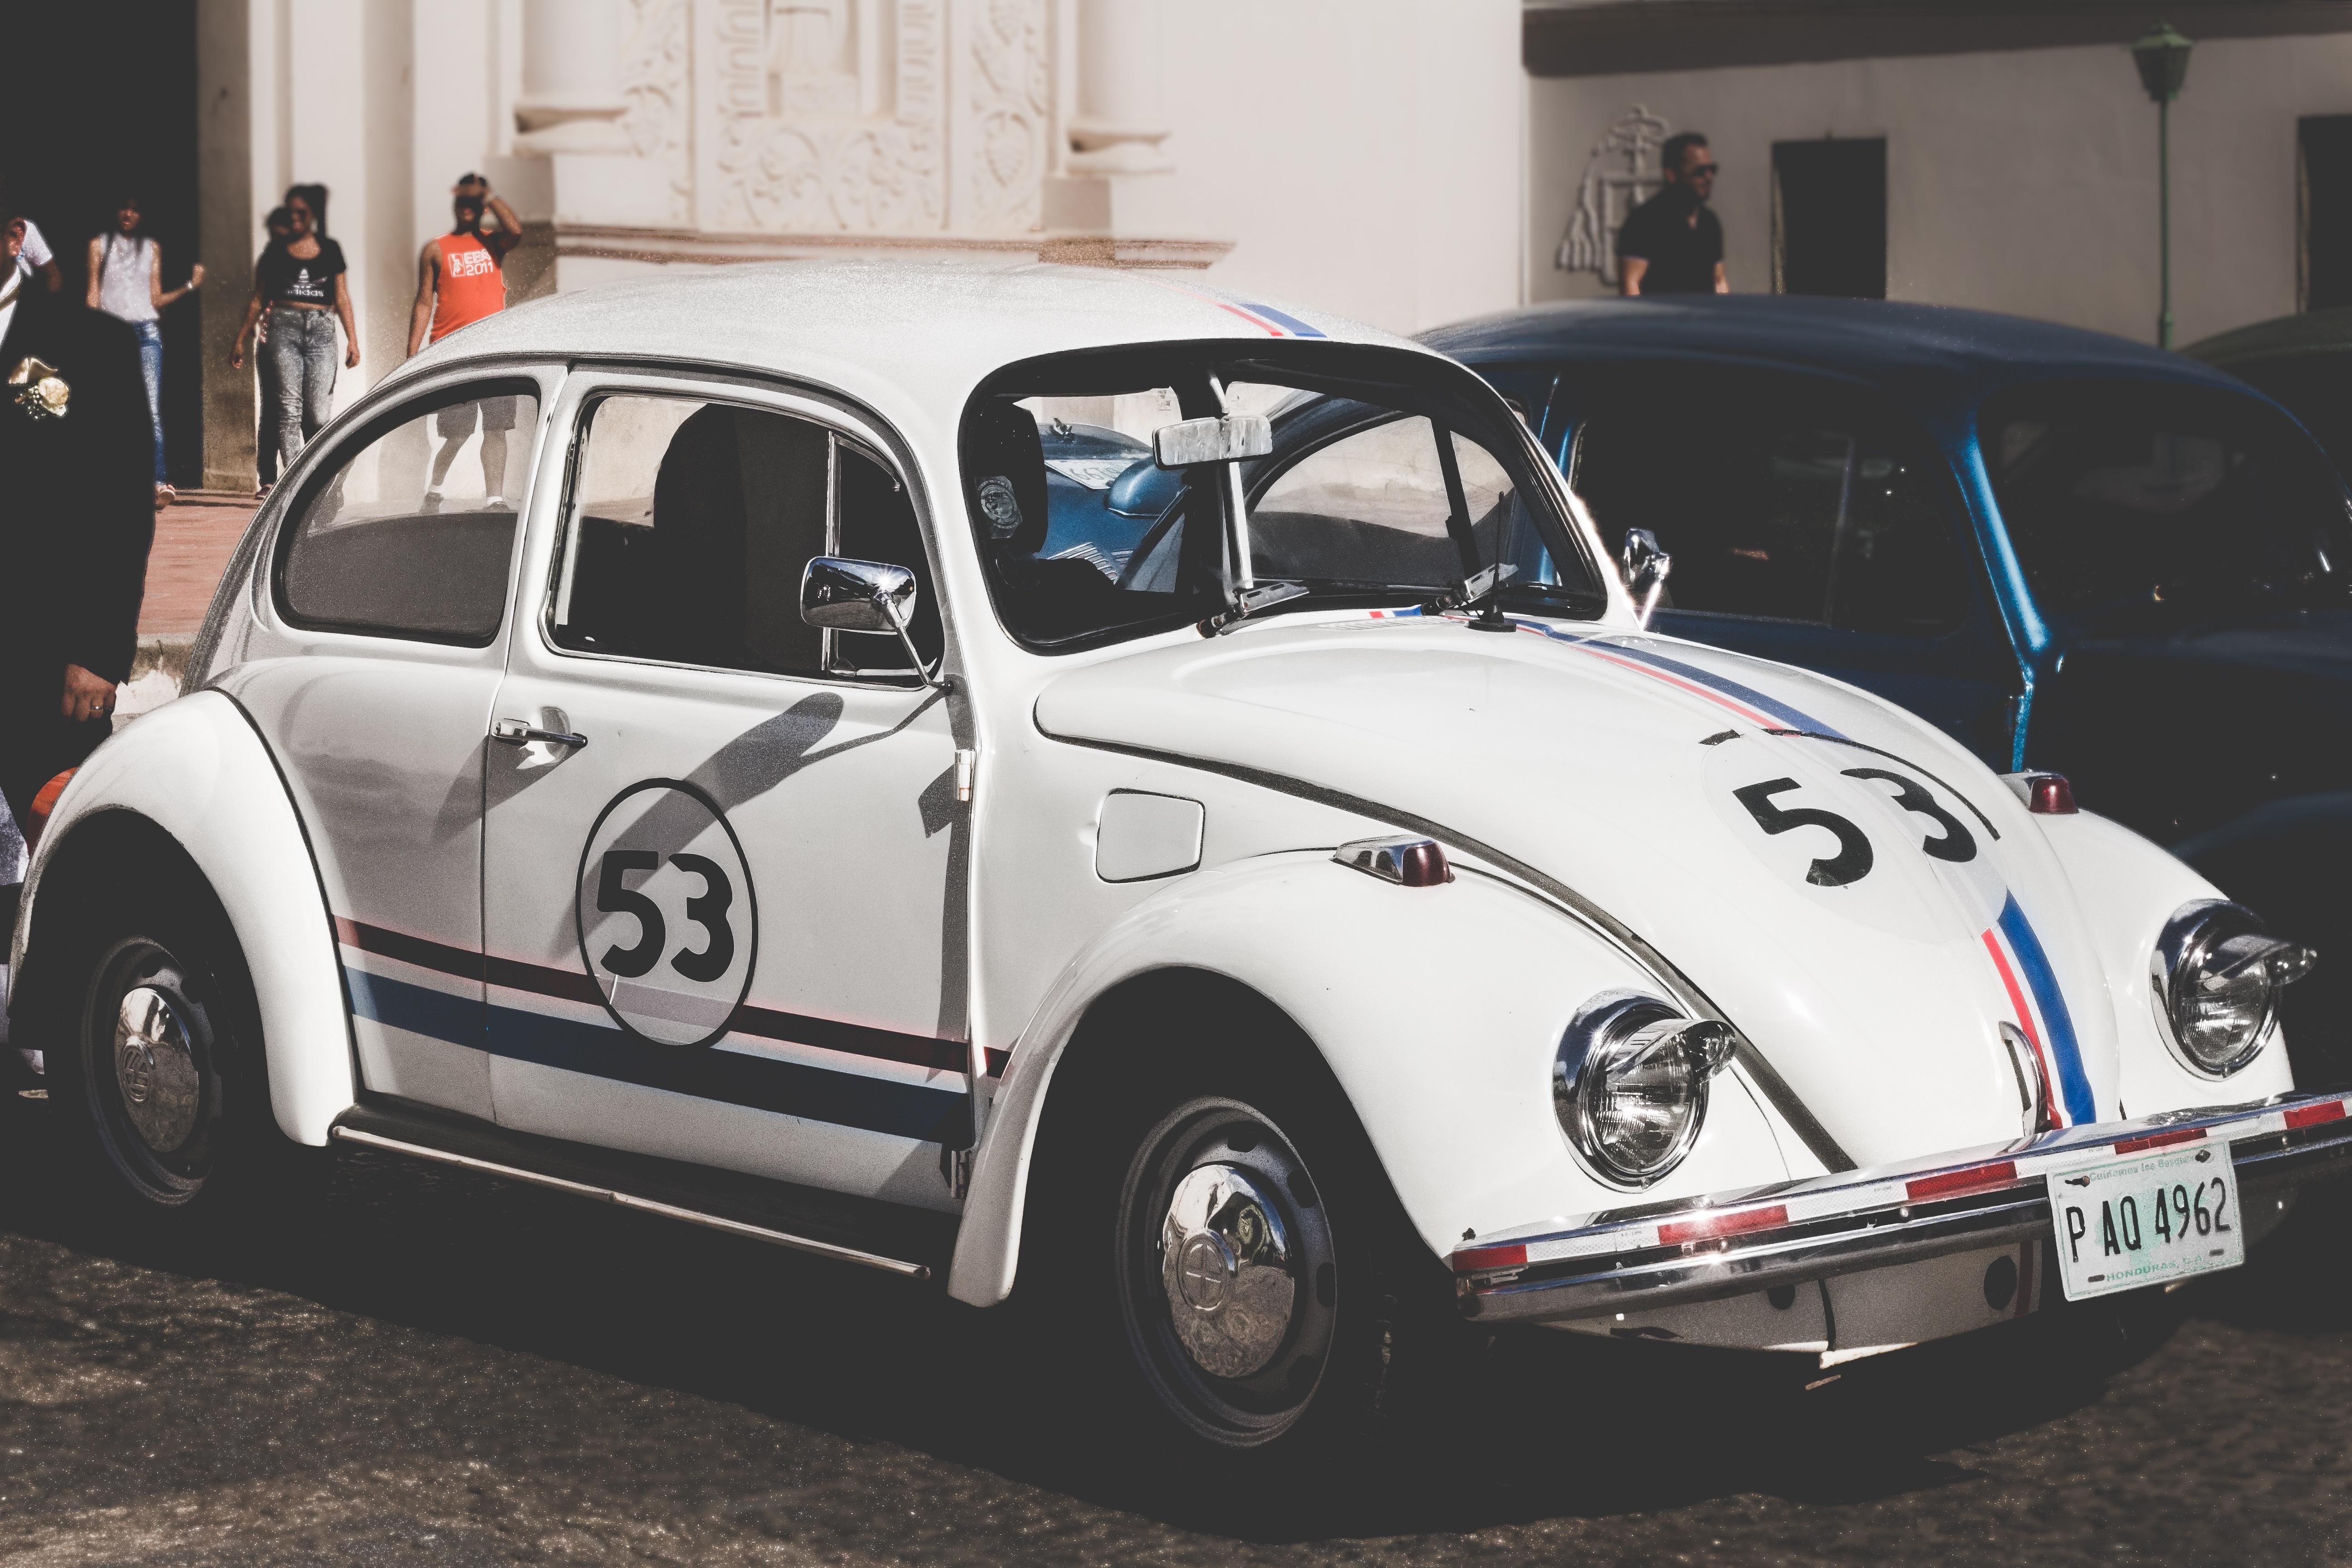 Free Images Wheel Volkswagen Bug Herbie 53 Antique Car City Car Land Vehicle Volkswagen Beetle Automobile Make Compact Car Automotive Design Mid Size Car Subcompact Car 5184x3456 73375 Free Stock Photos Pxhere